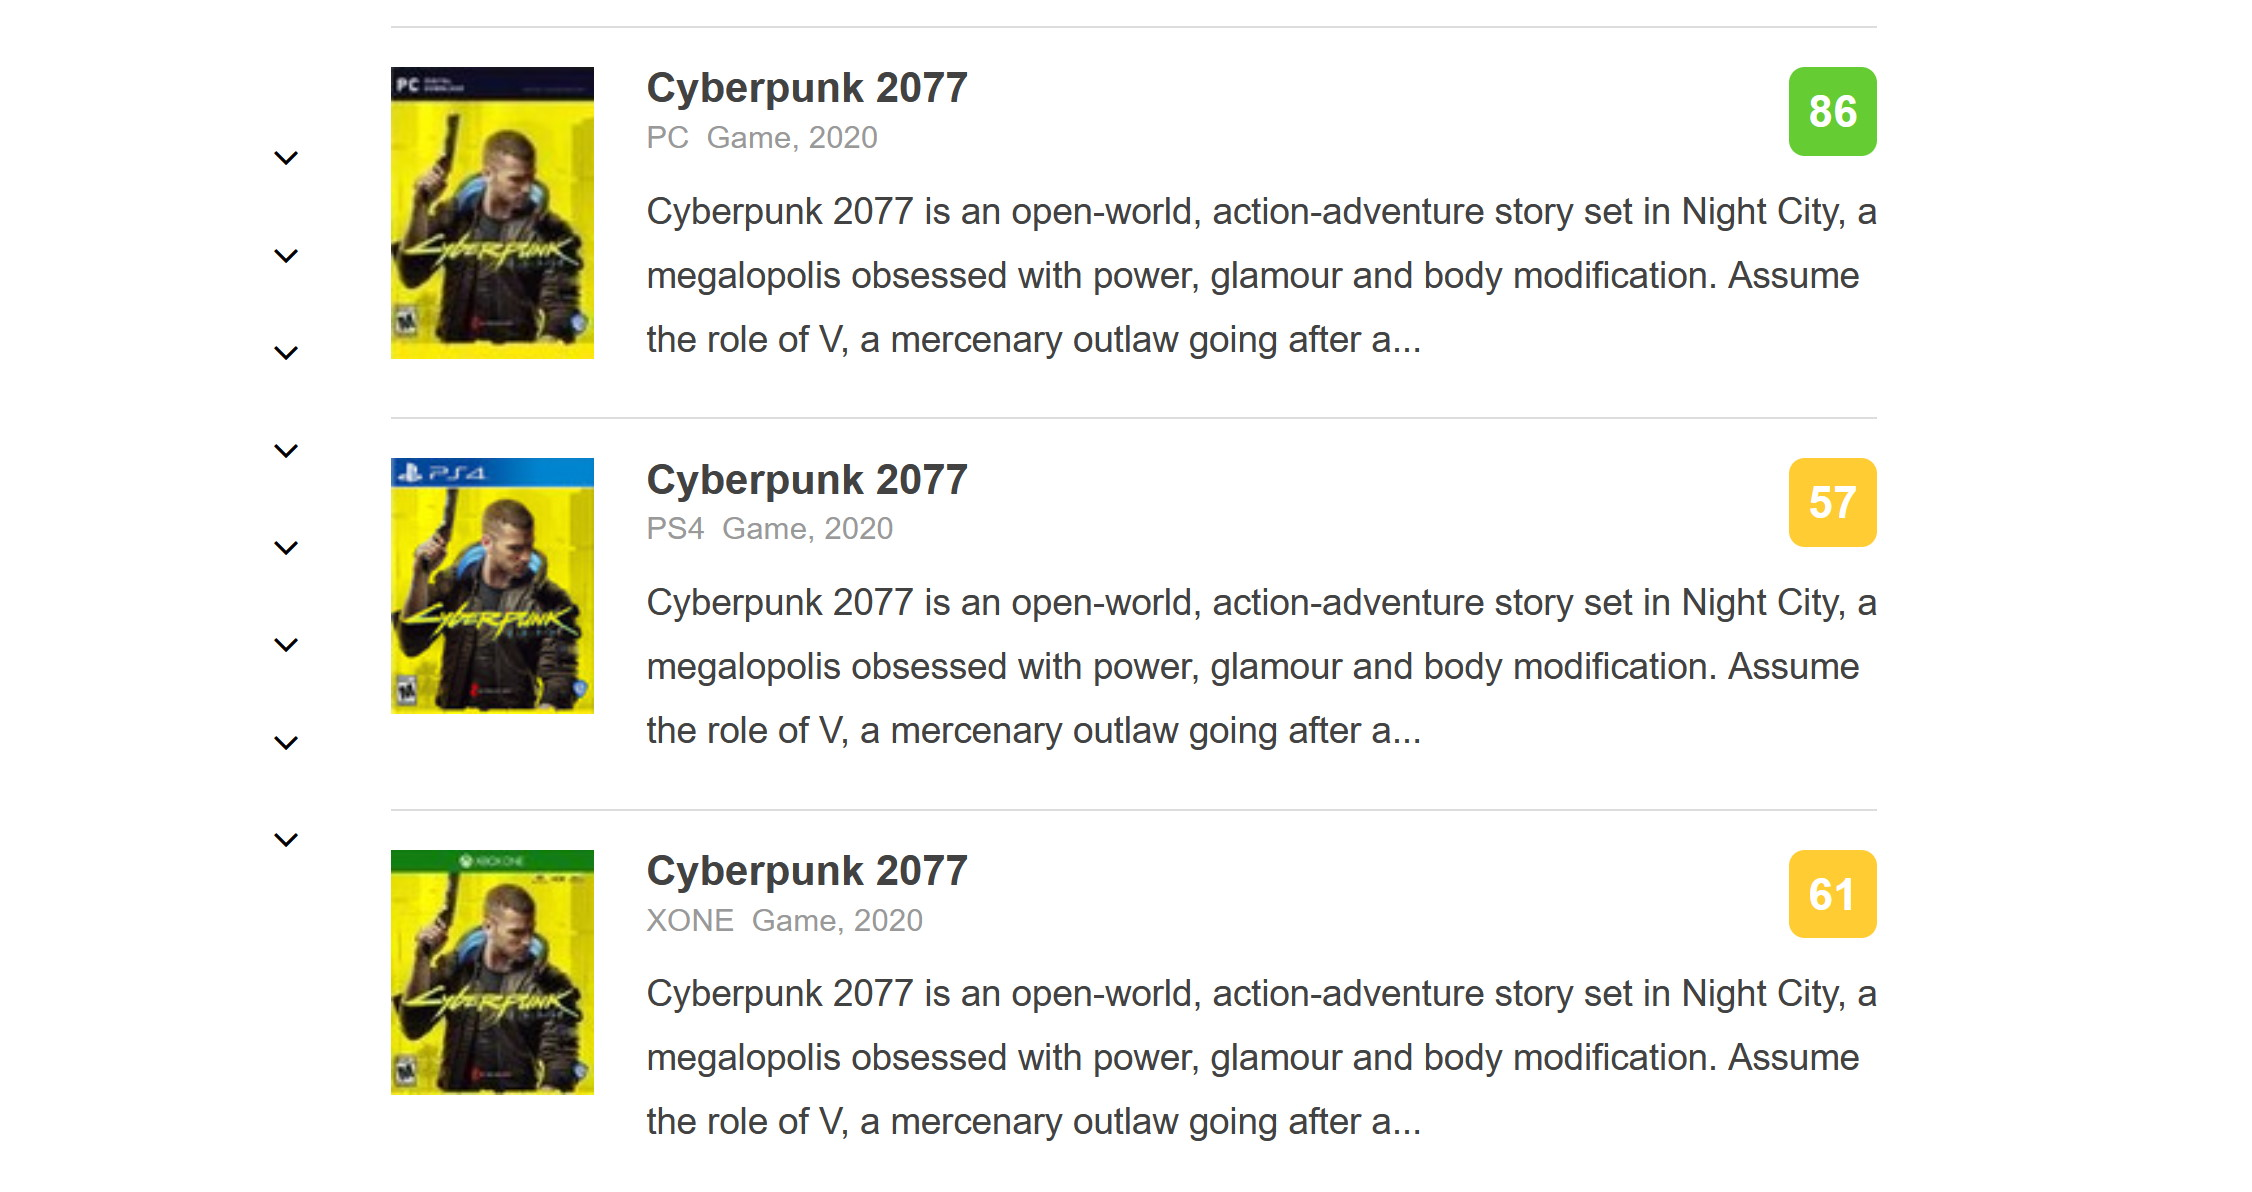 Cyberpunk 2077 Metacritic scores